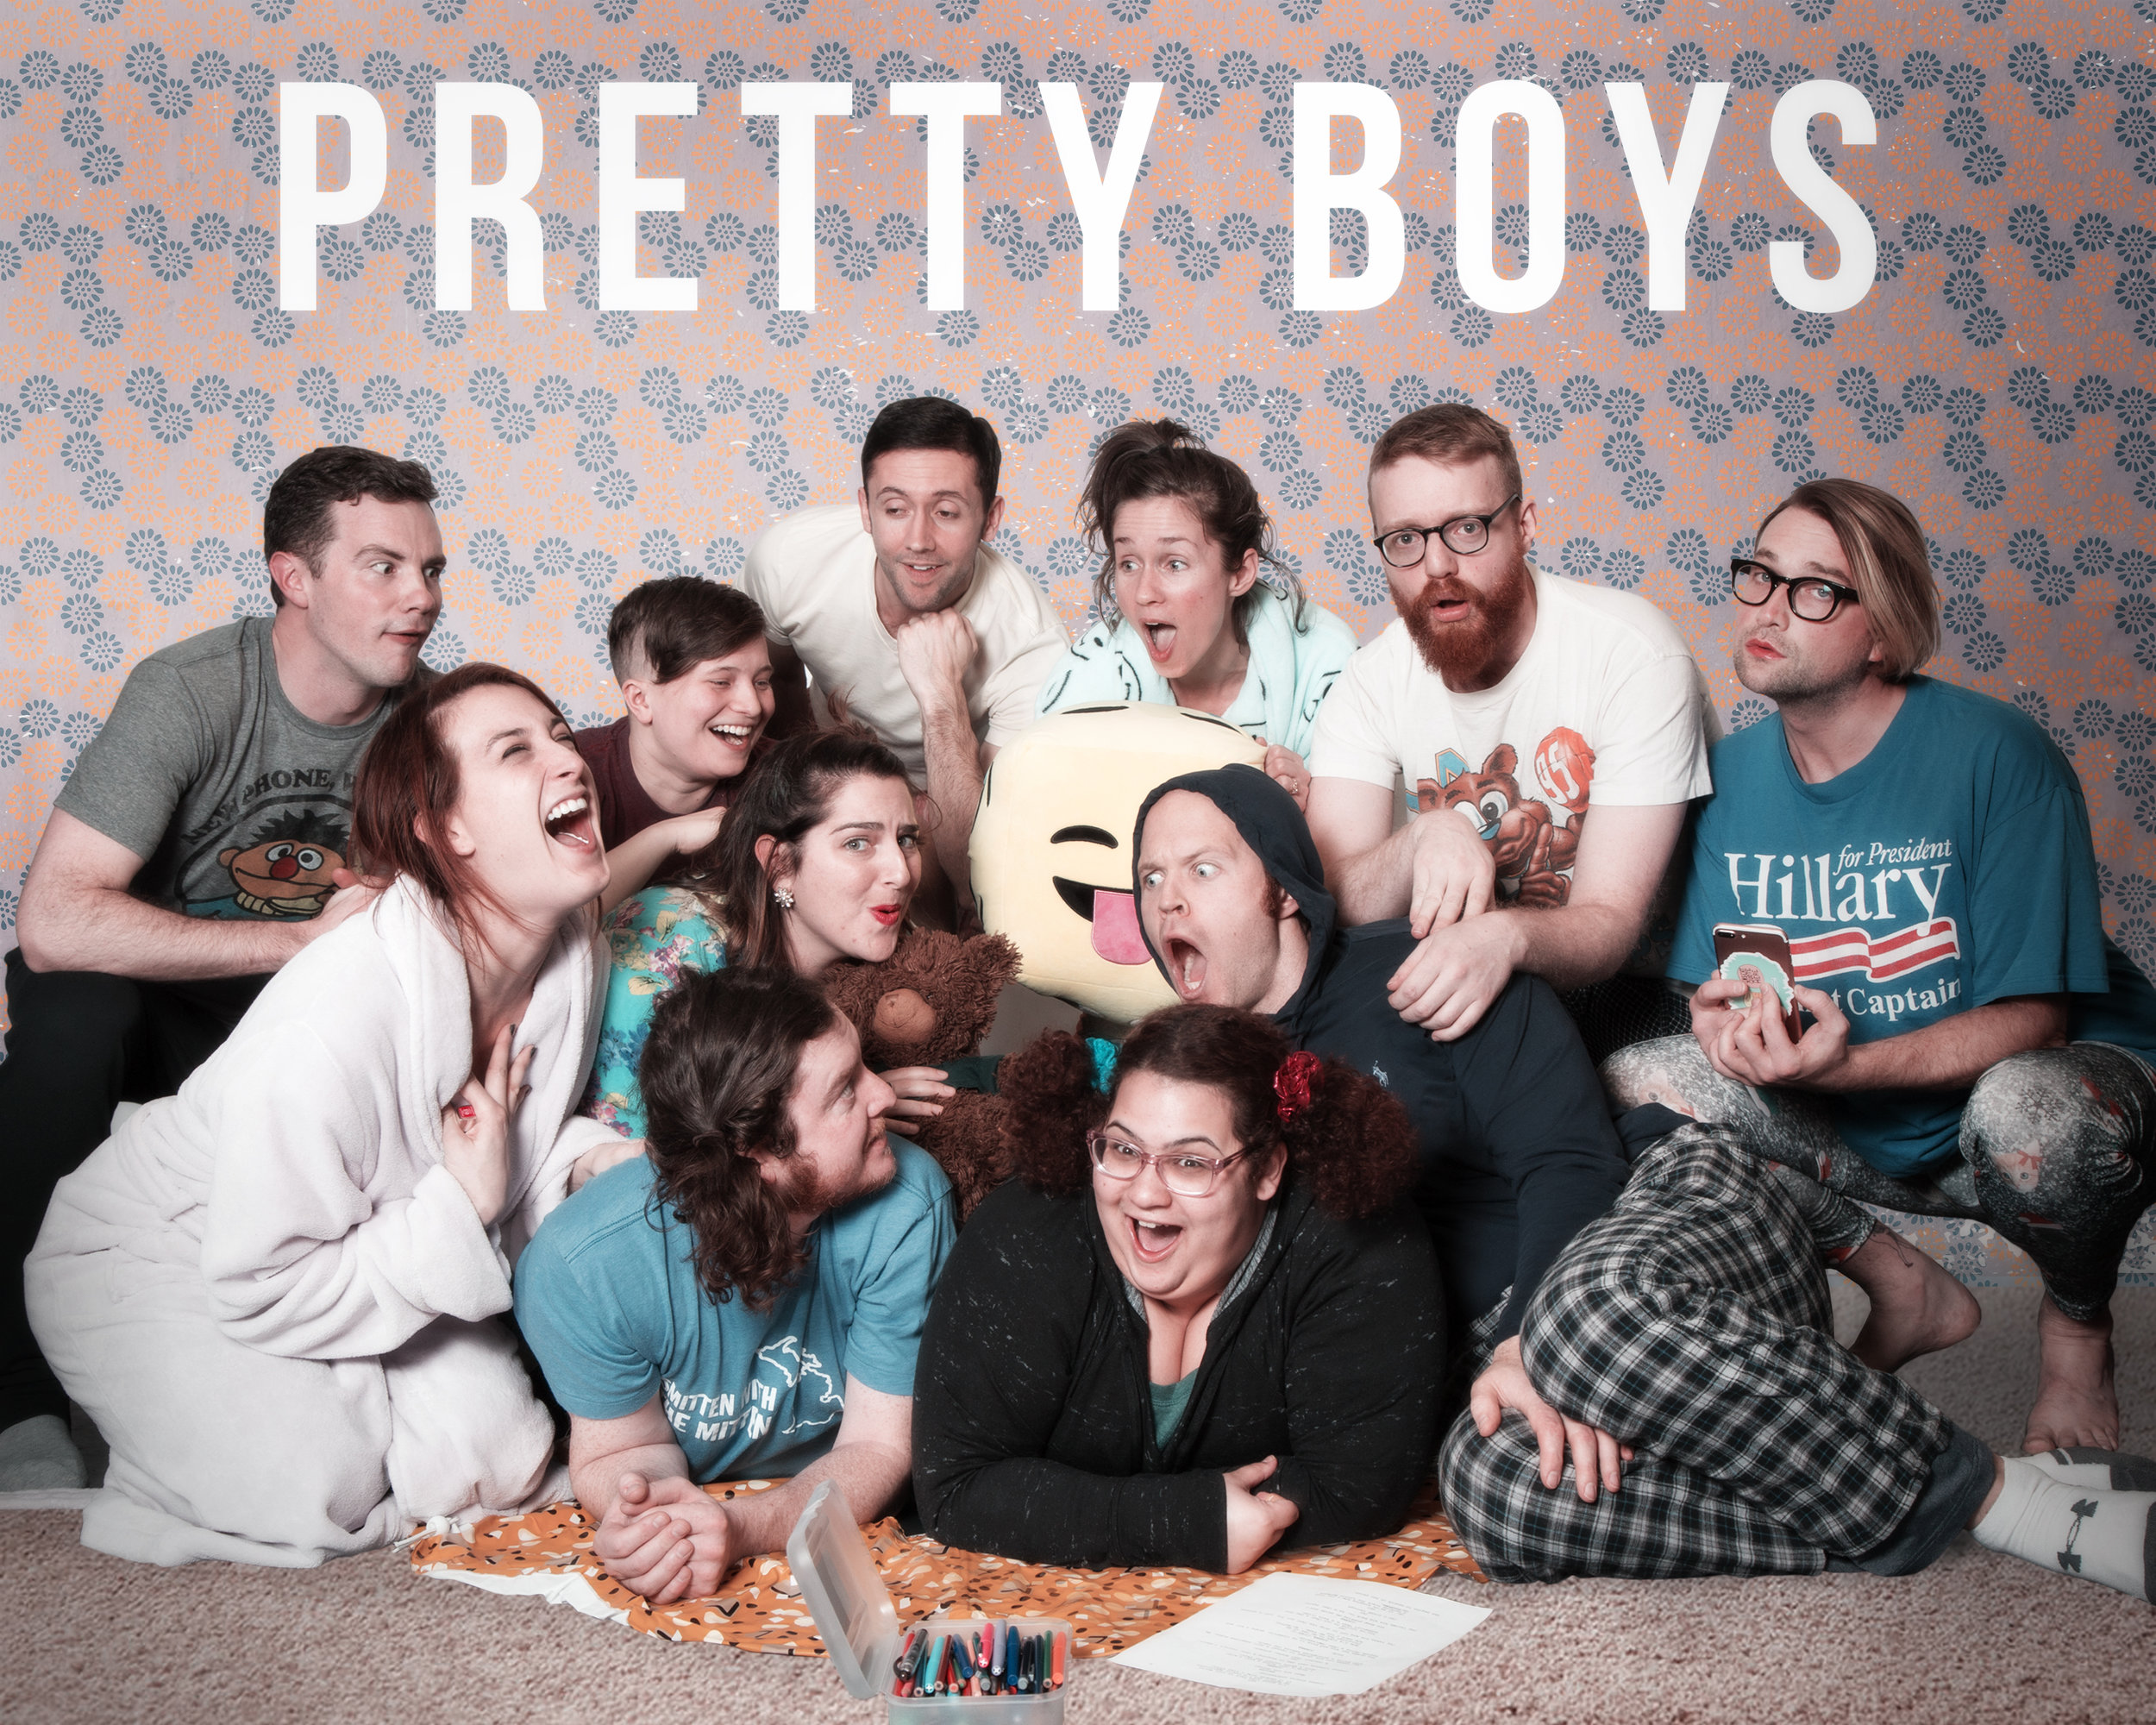 Pretty boys 2018 final.jpg